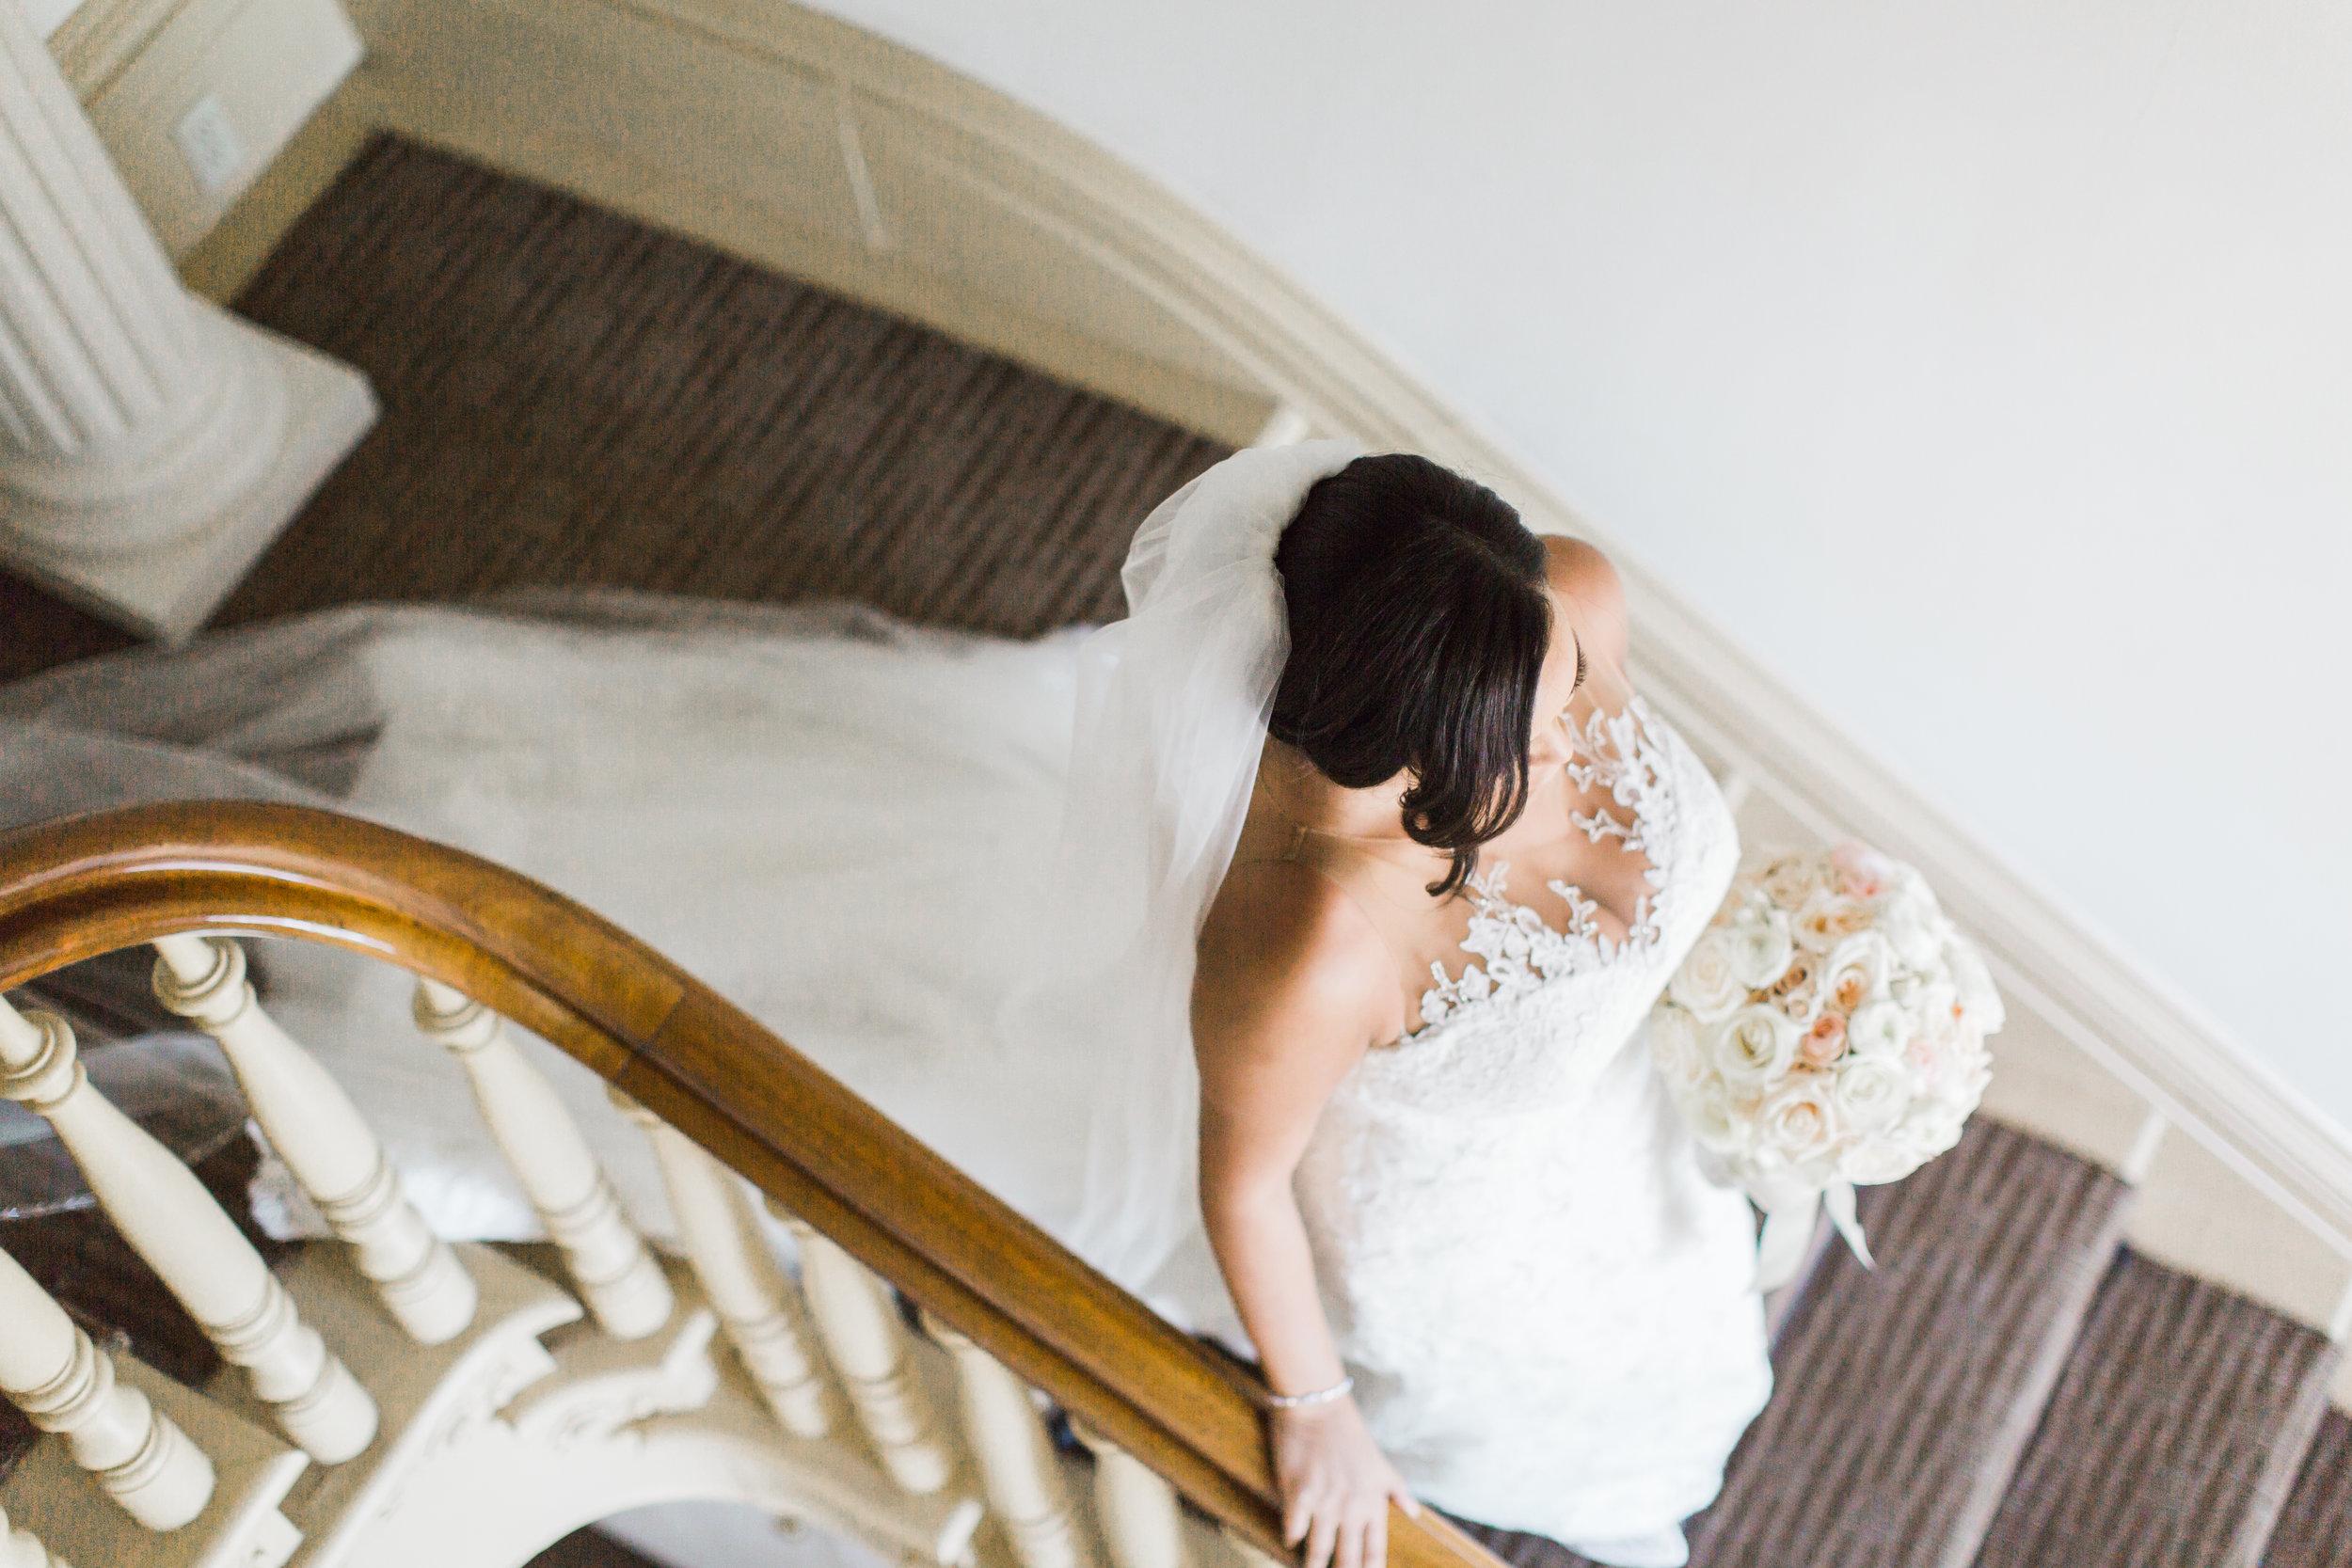 jenny-and-george-wedding-roque-events-meyerott-photography 288.jpg